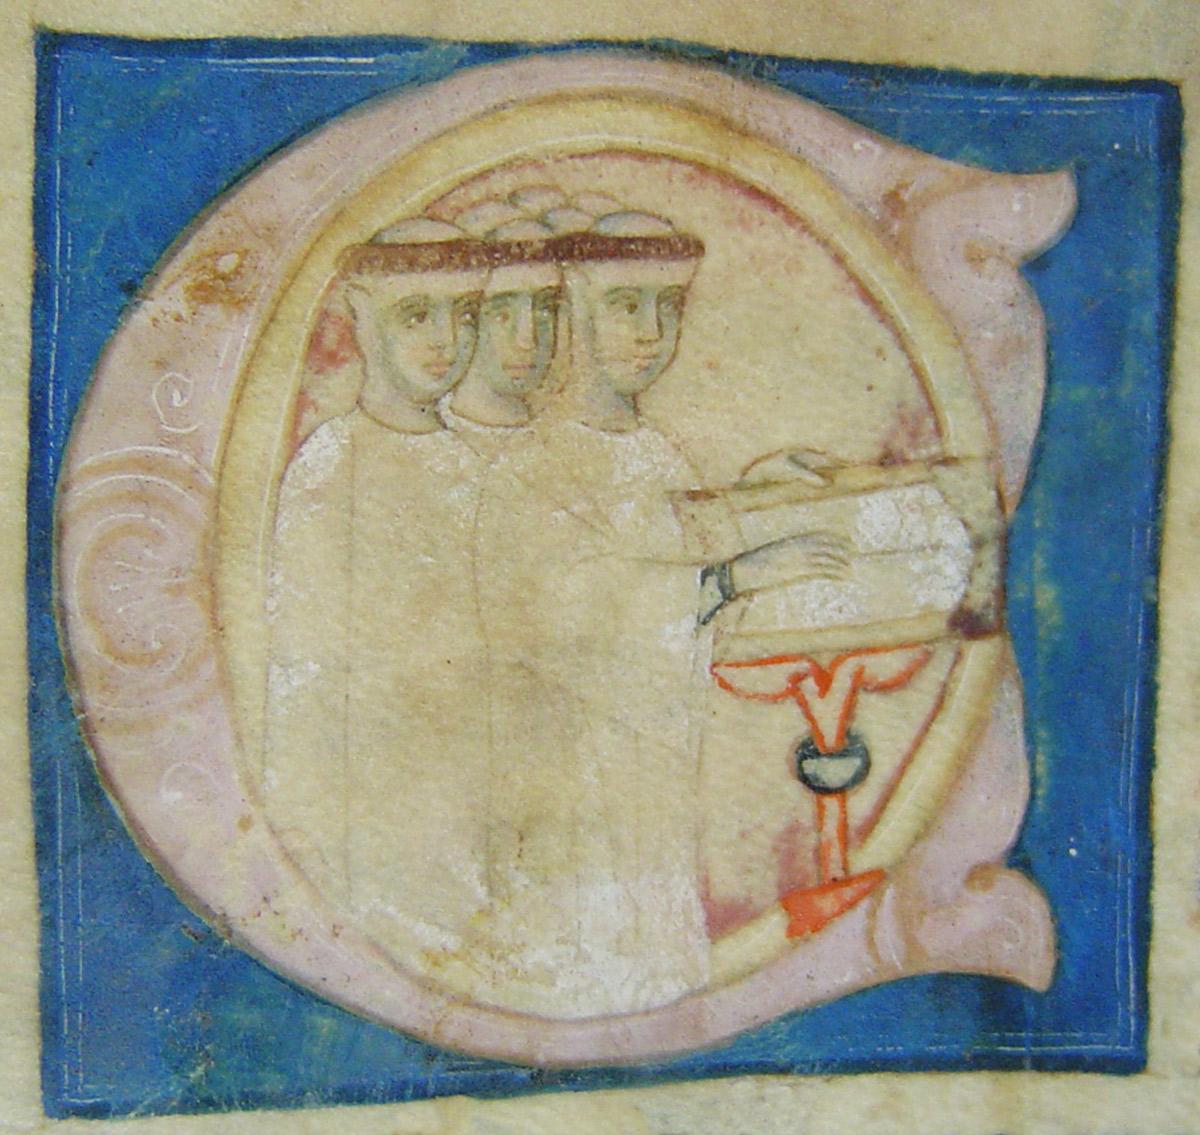 camaldoli-proposta-monastica-1